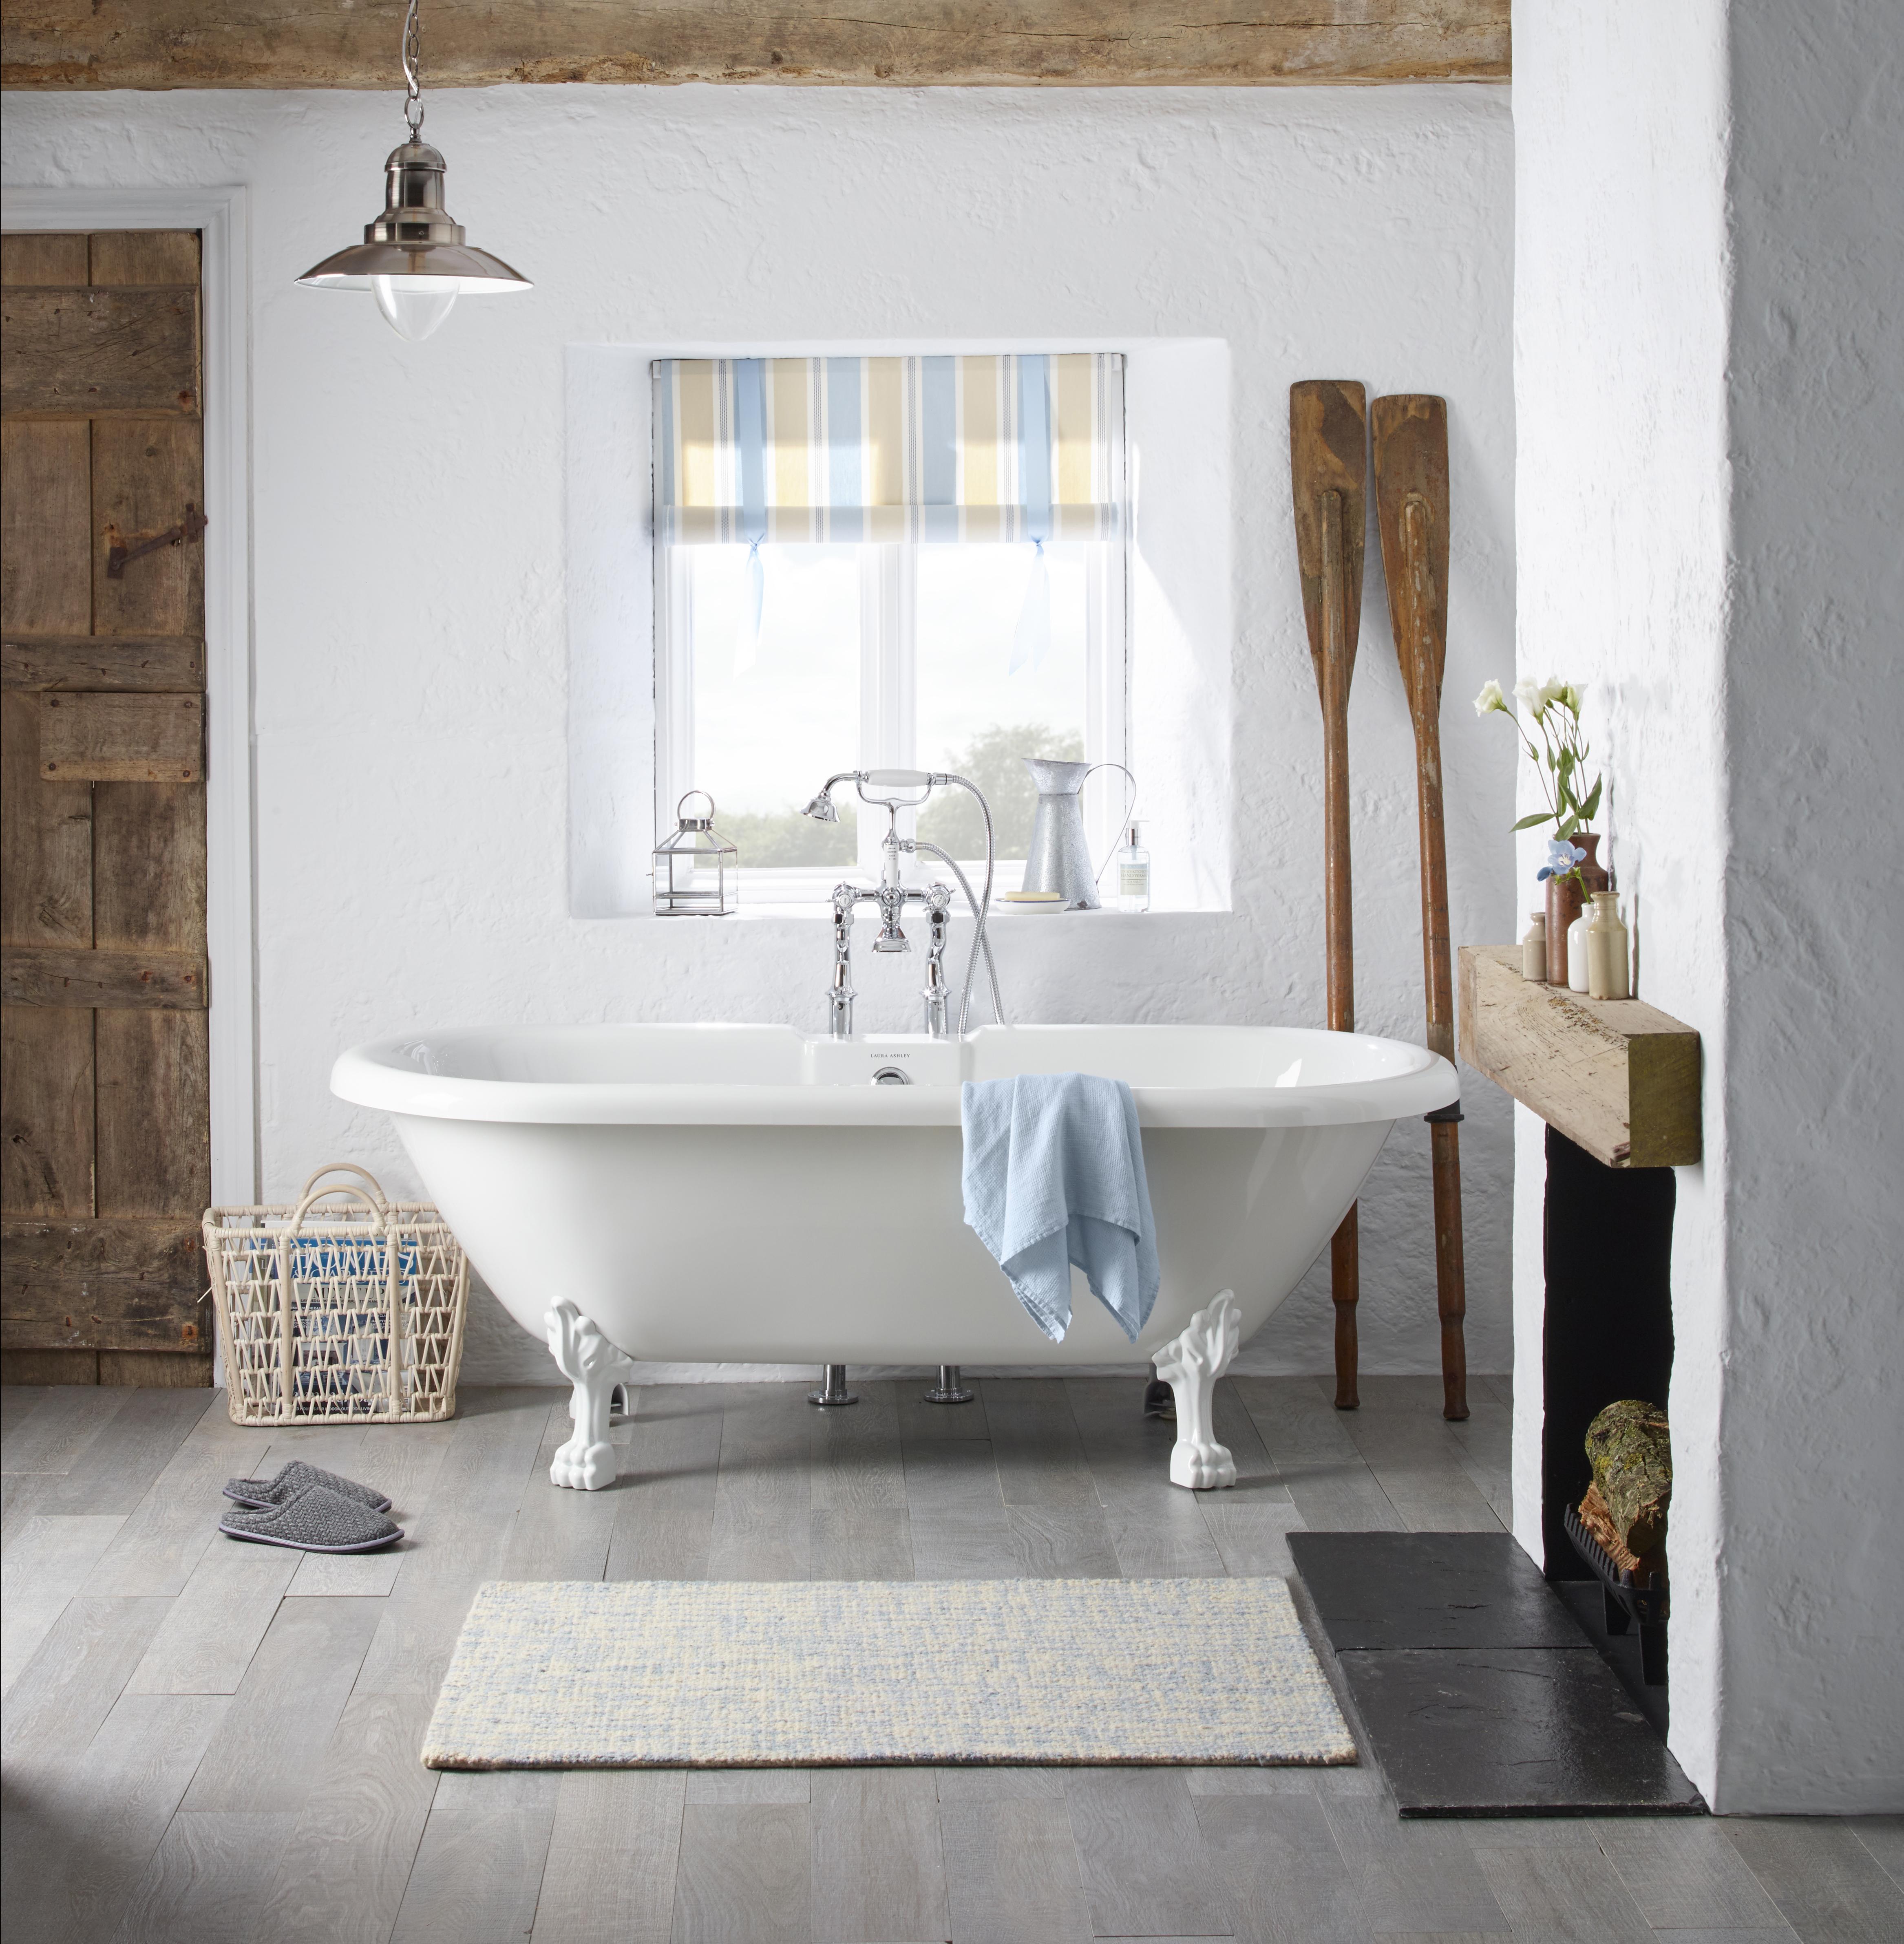 Fairfield double ended roll top bath tub blue flower_LIFESTYLE